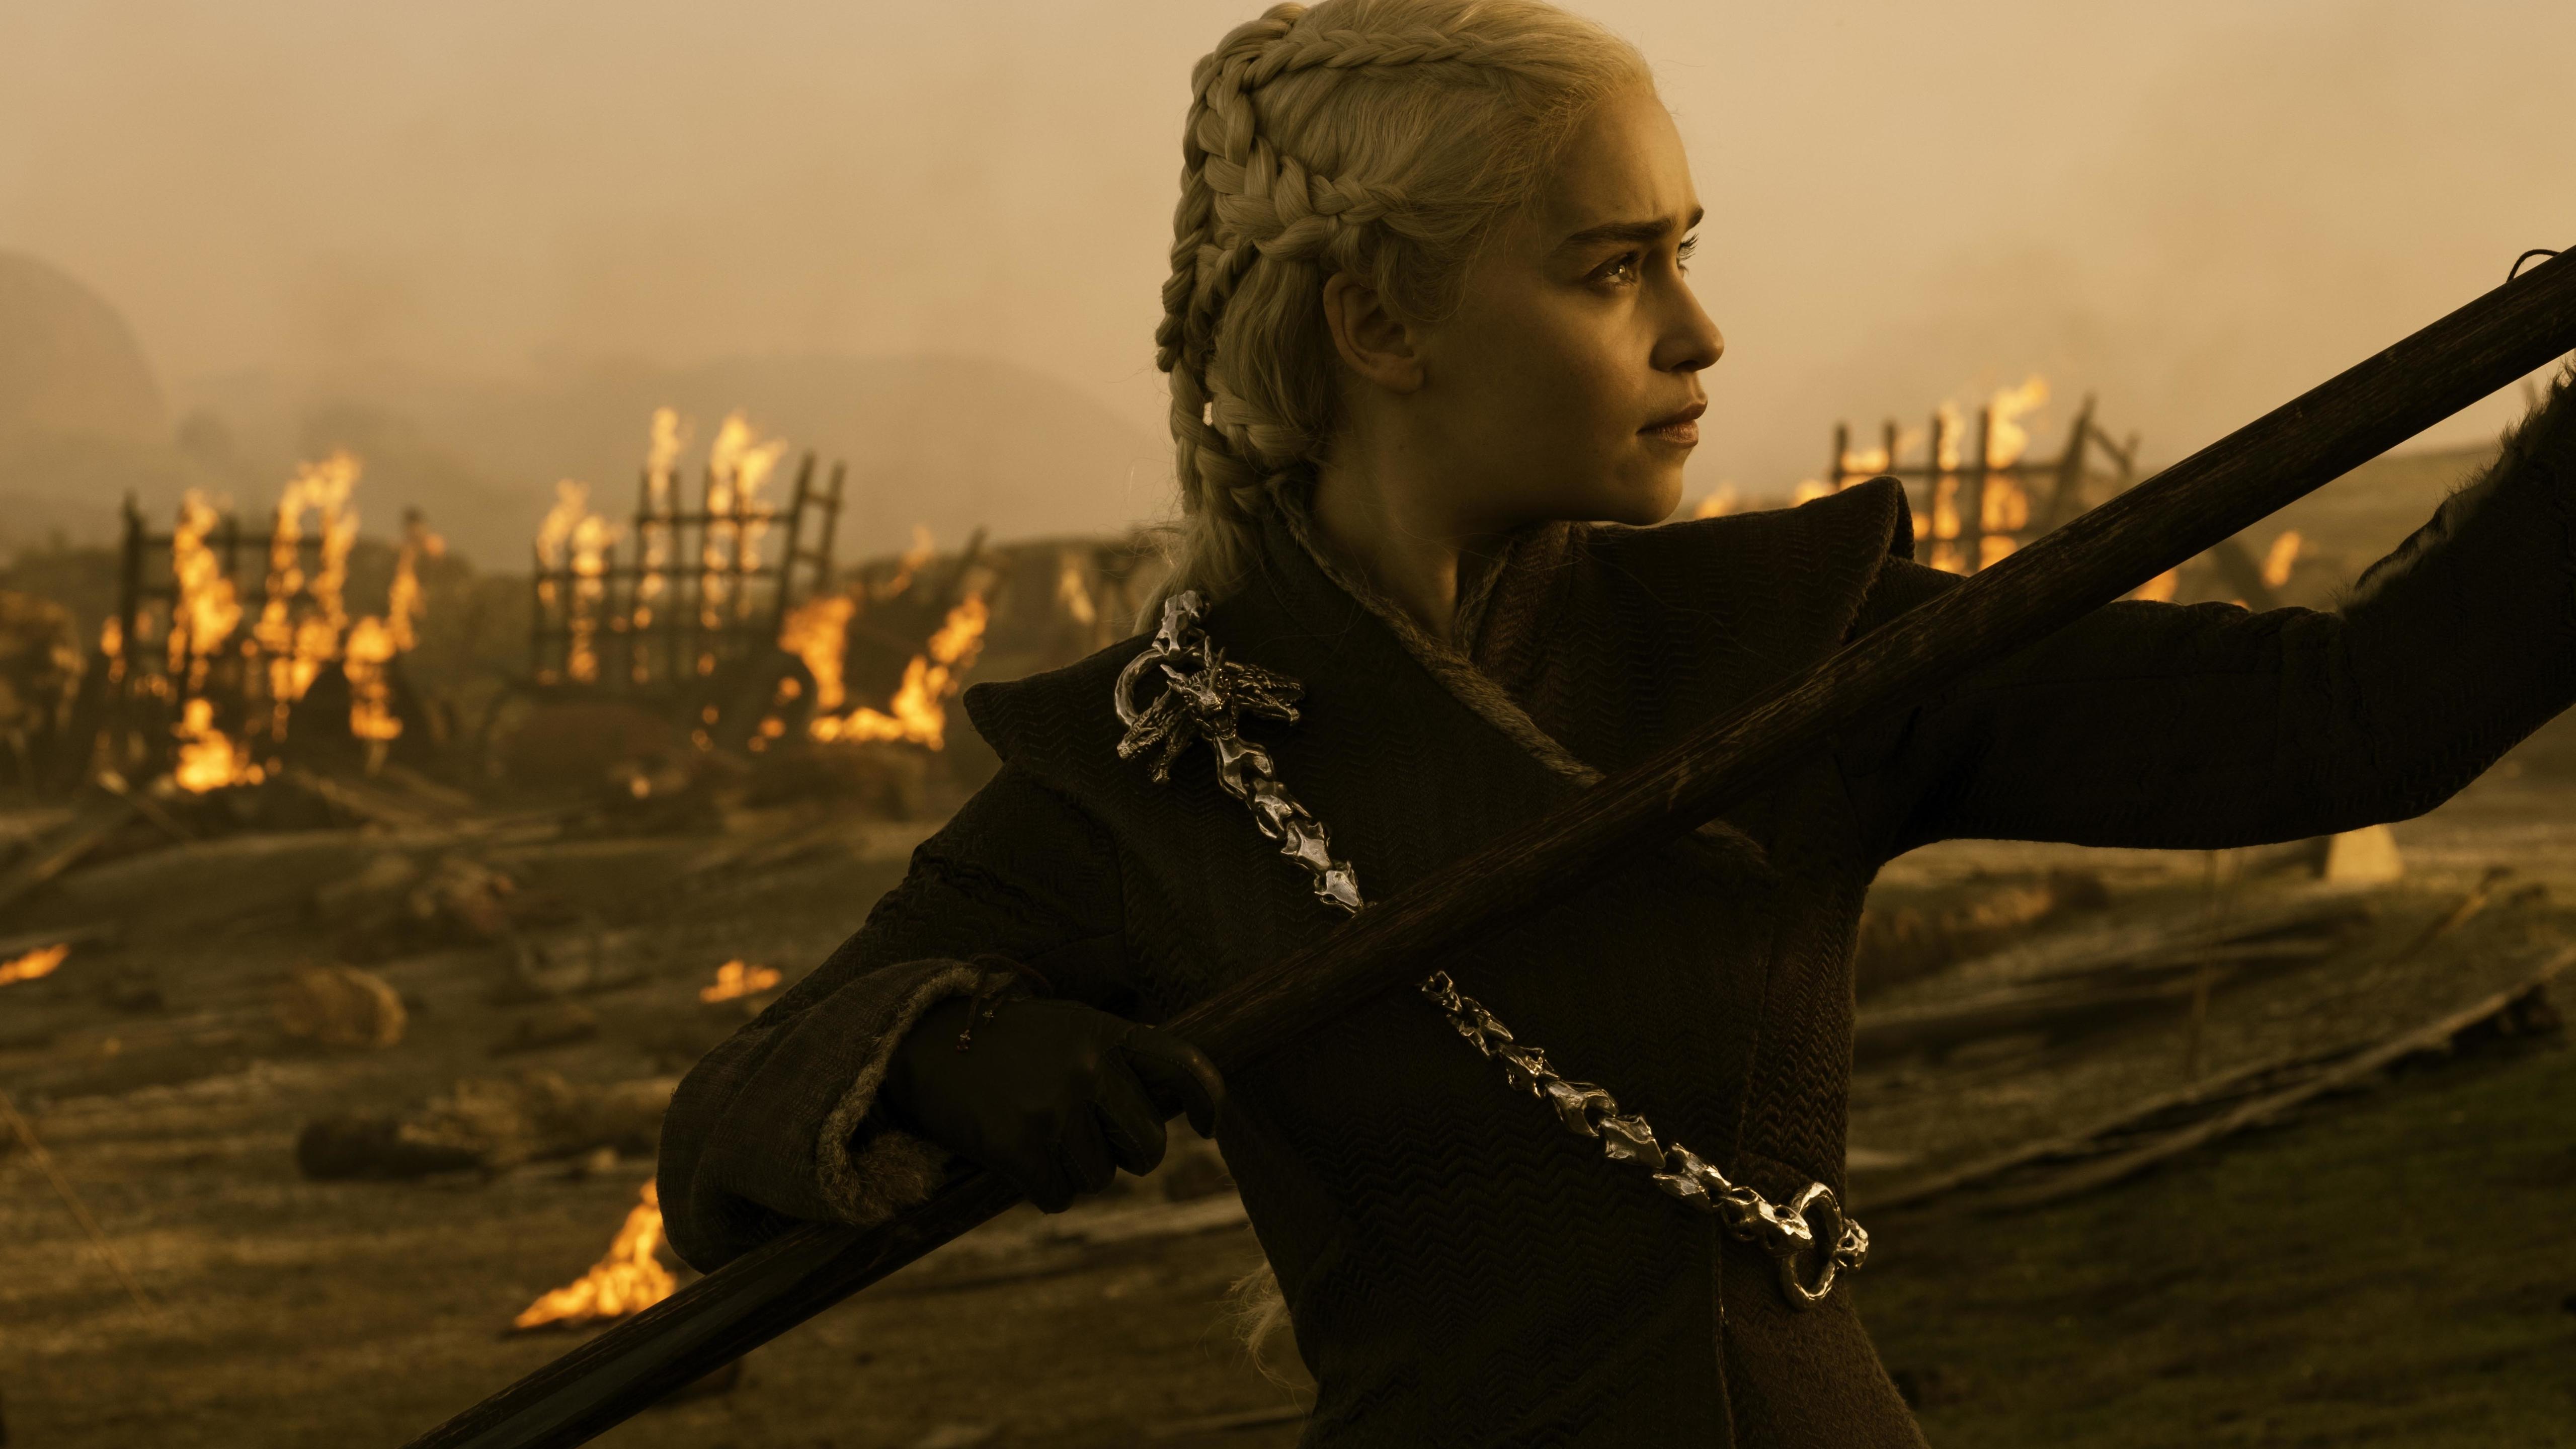 5120x2880 Game Of Thrones Season 7 Emilia Clarke As Daenerys